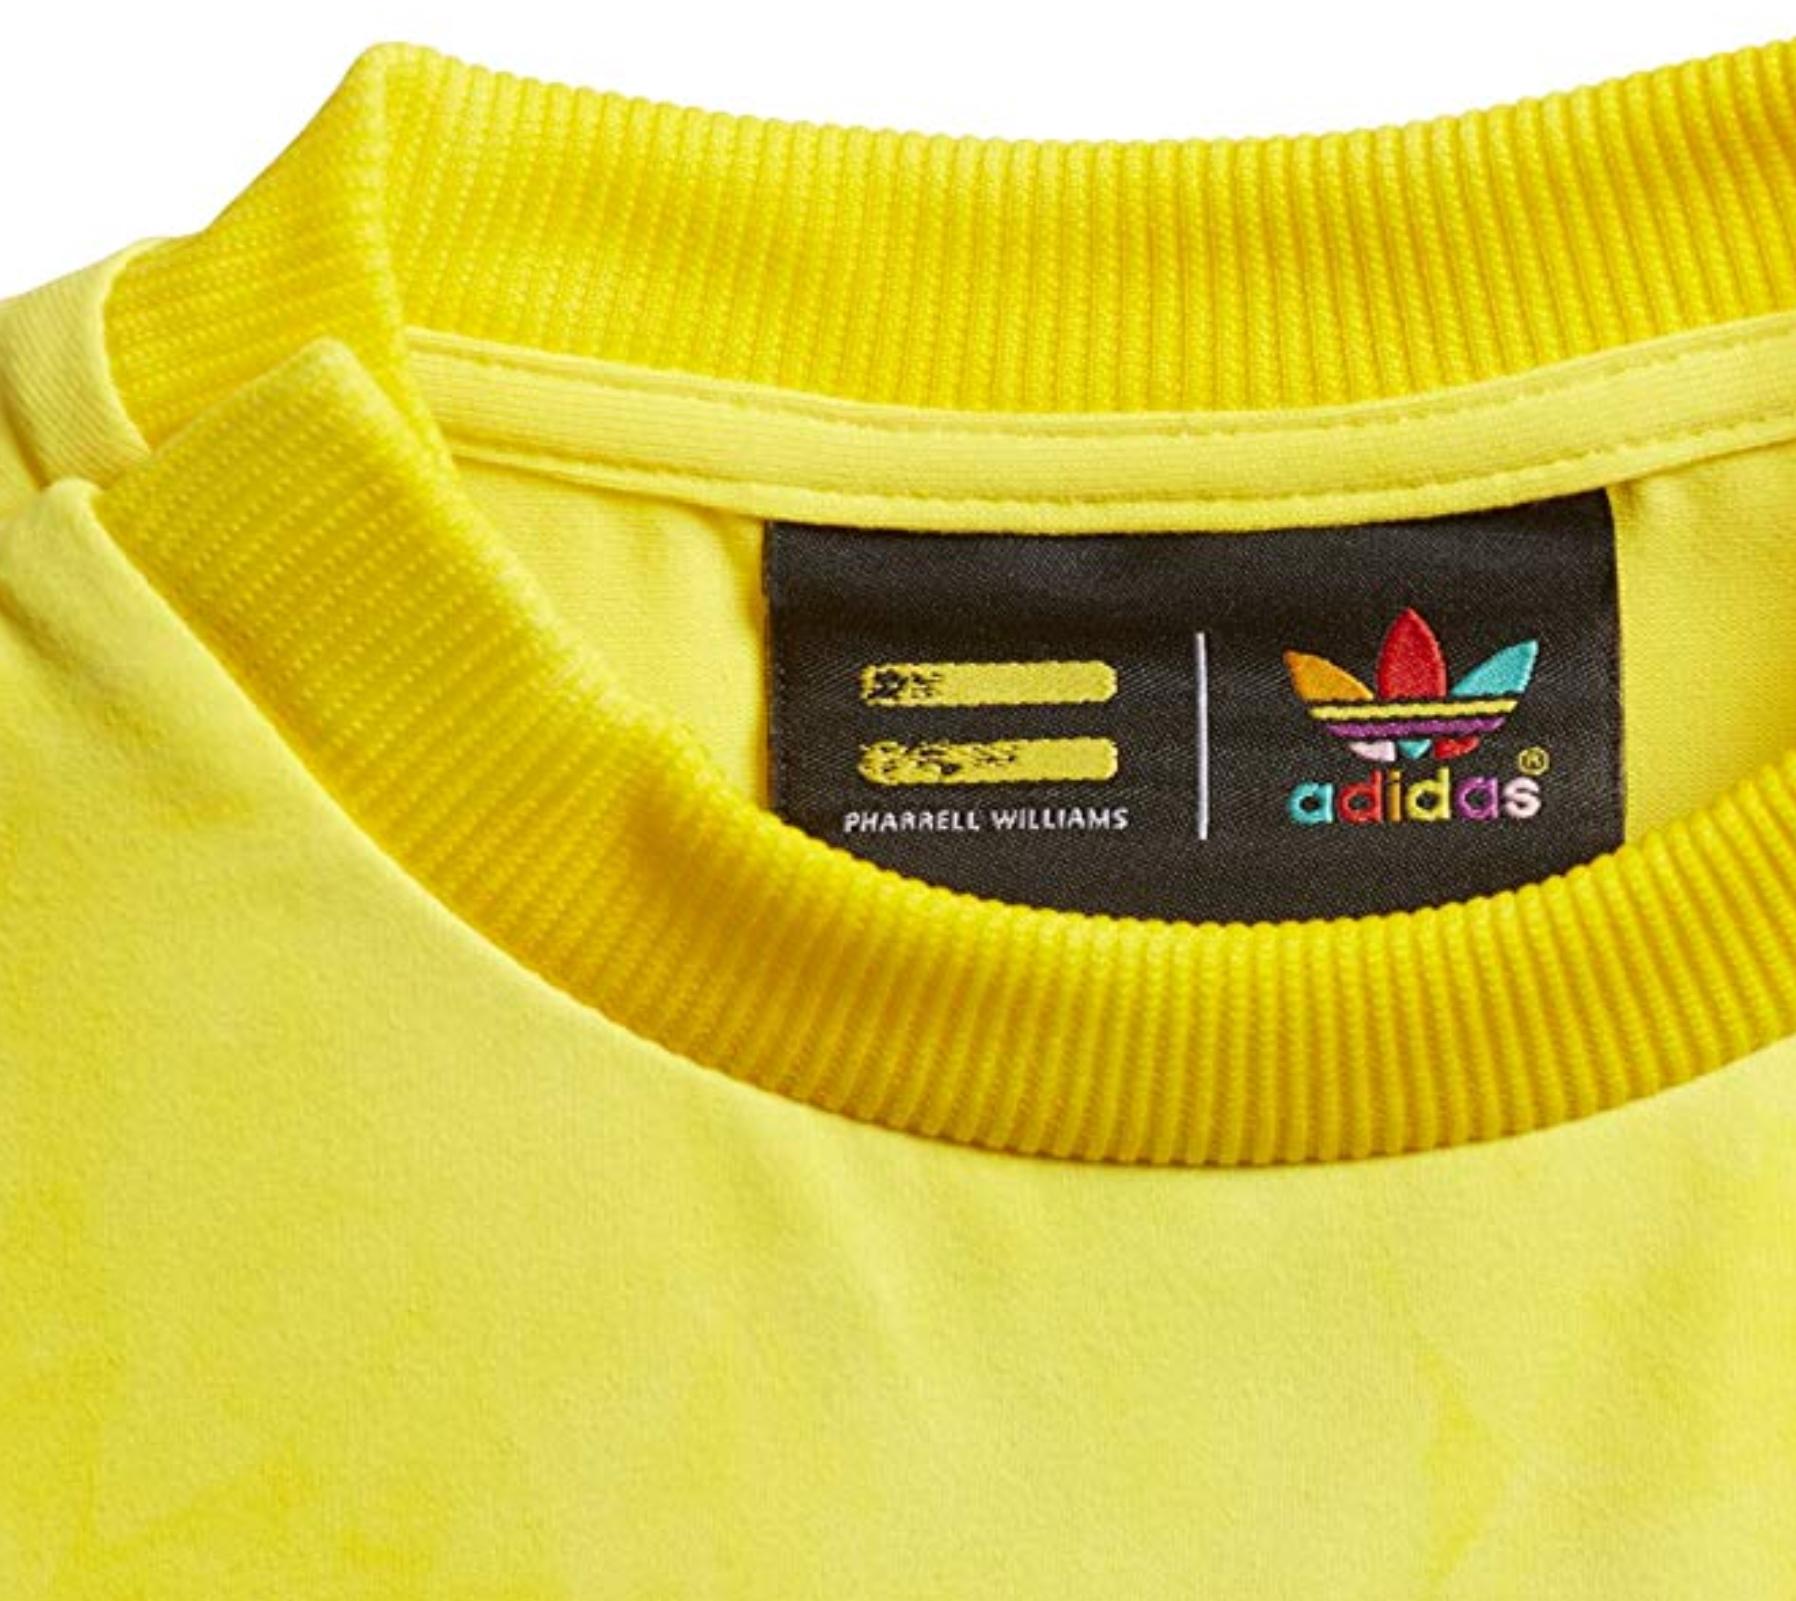 1bdf605fe117f Adidas Originals Pharrell Williams HU Holi Infants T-Shirt Yellow ...